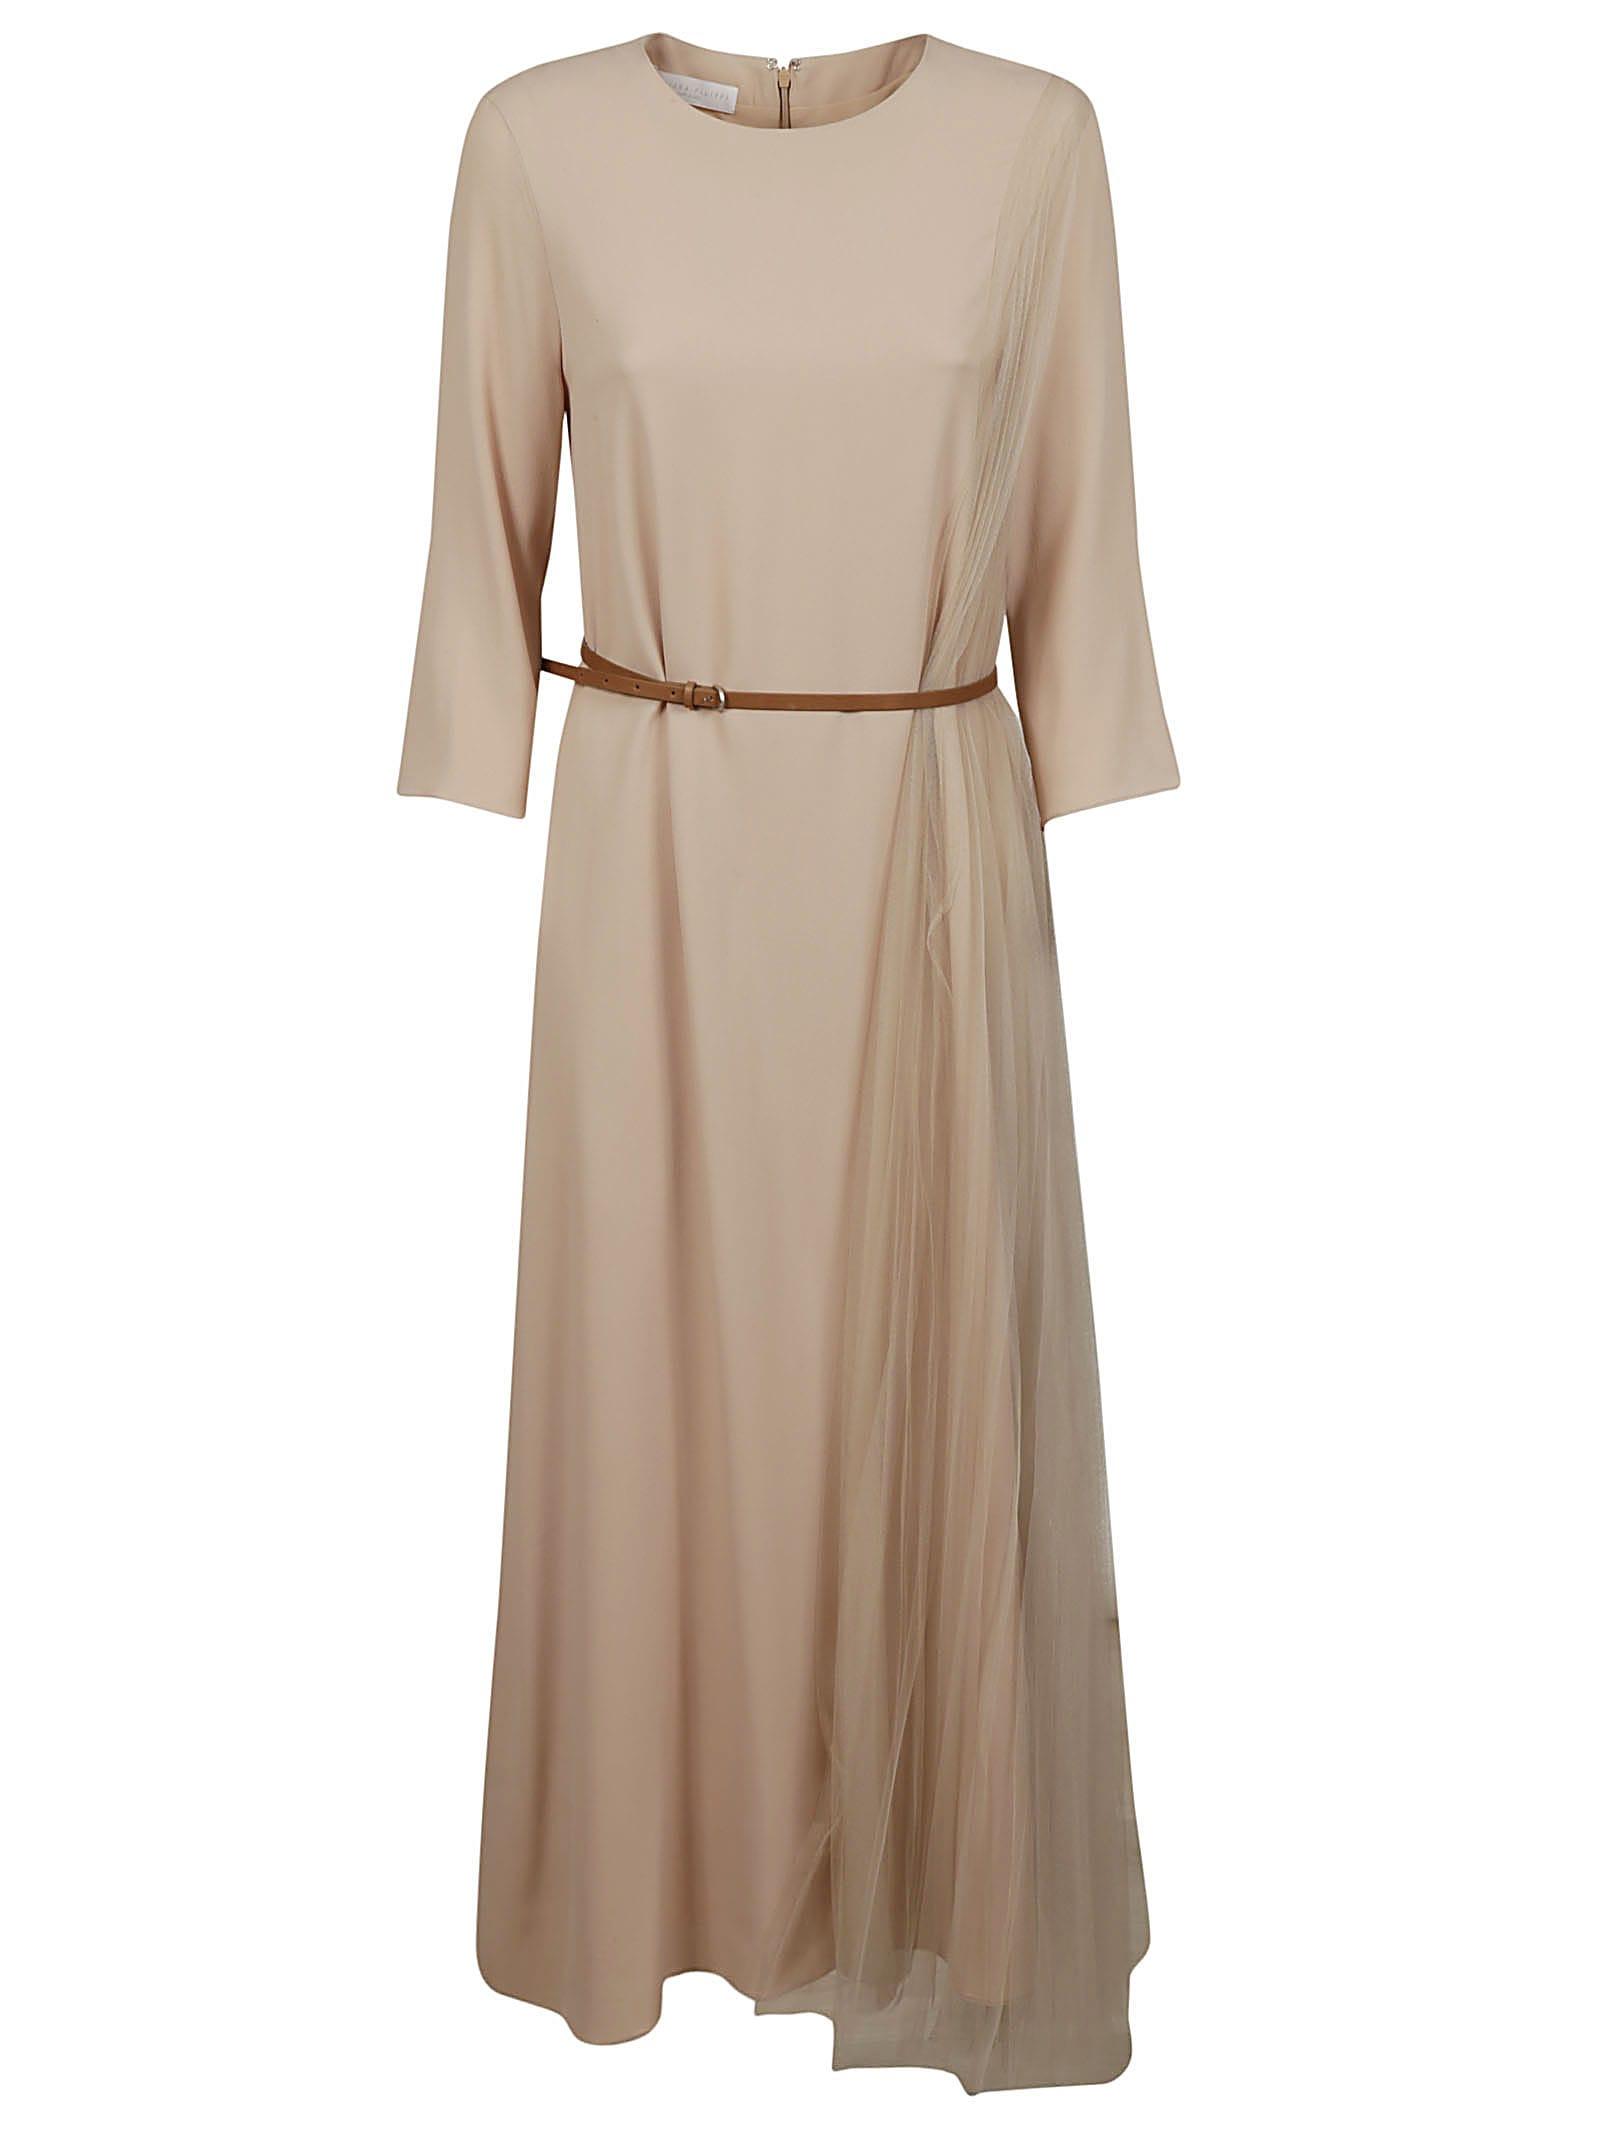 Buy Fabiana Filippi Belted Maxi Dress online, shop Fabiana Filippi with free shipping